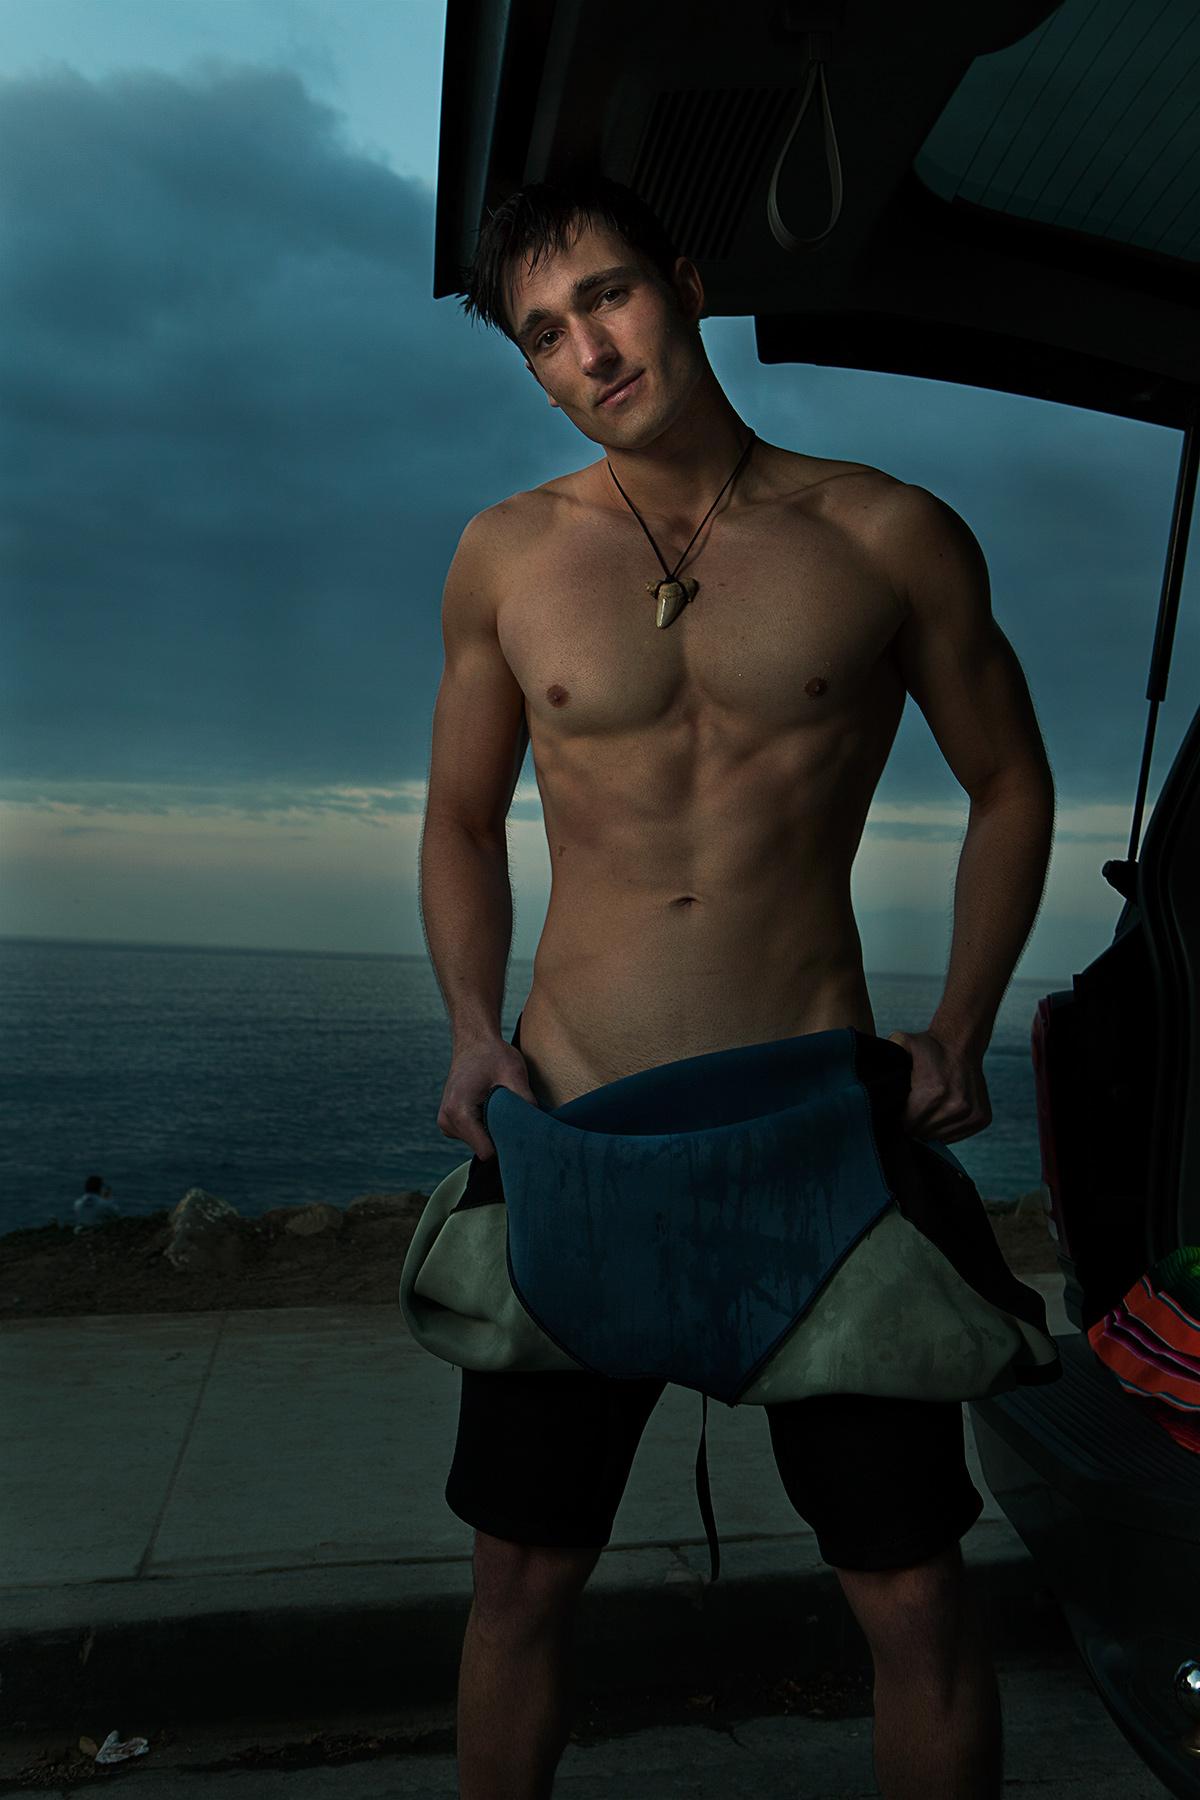 Luke Wilder - Gay Porn Star - San Diego, CA